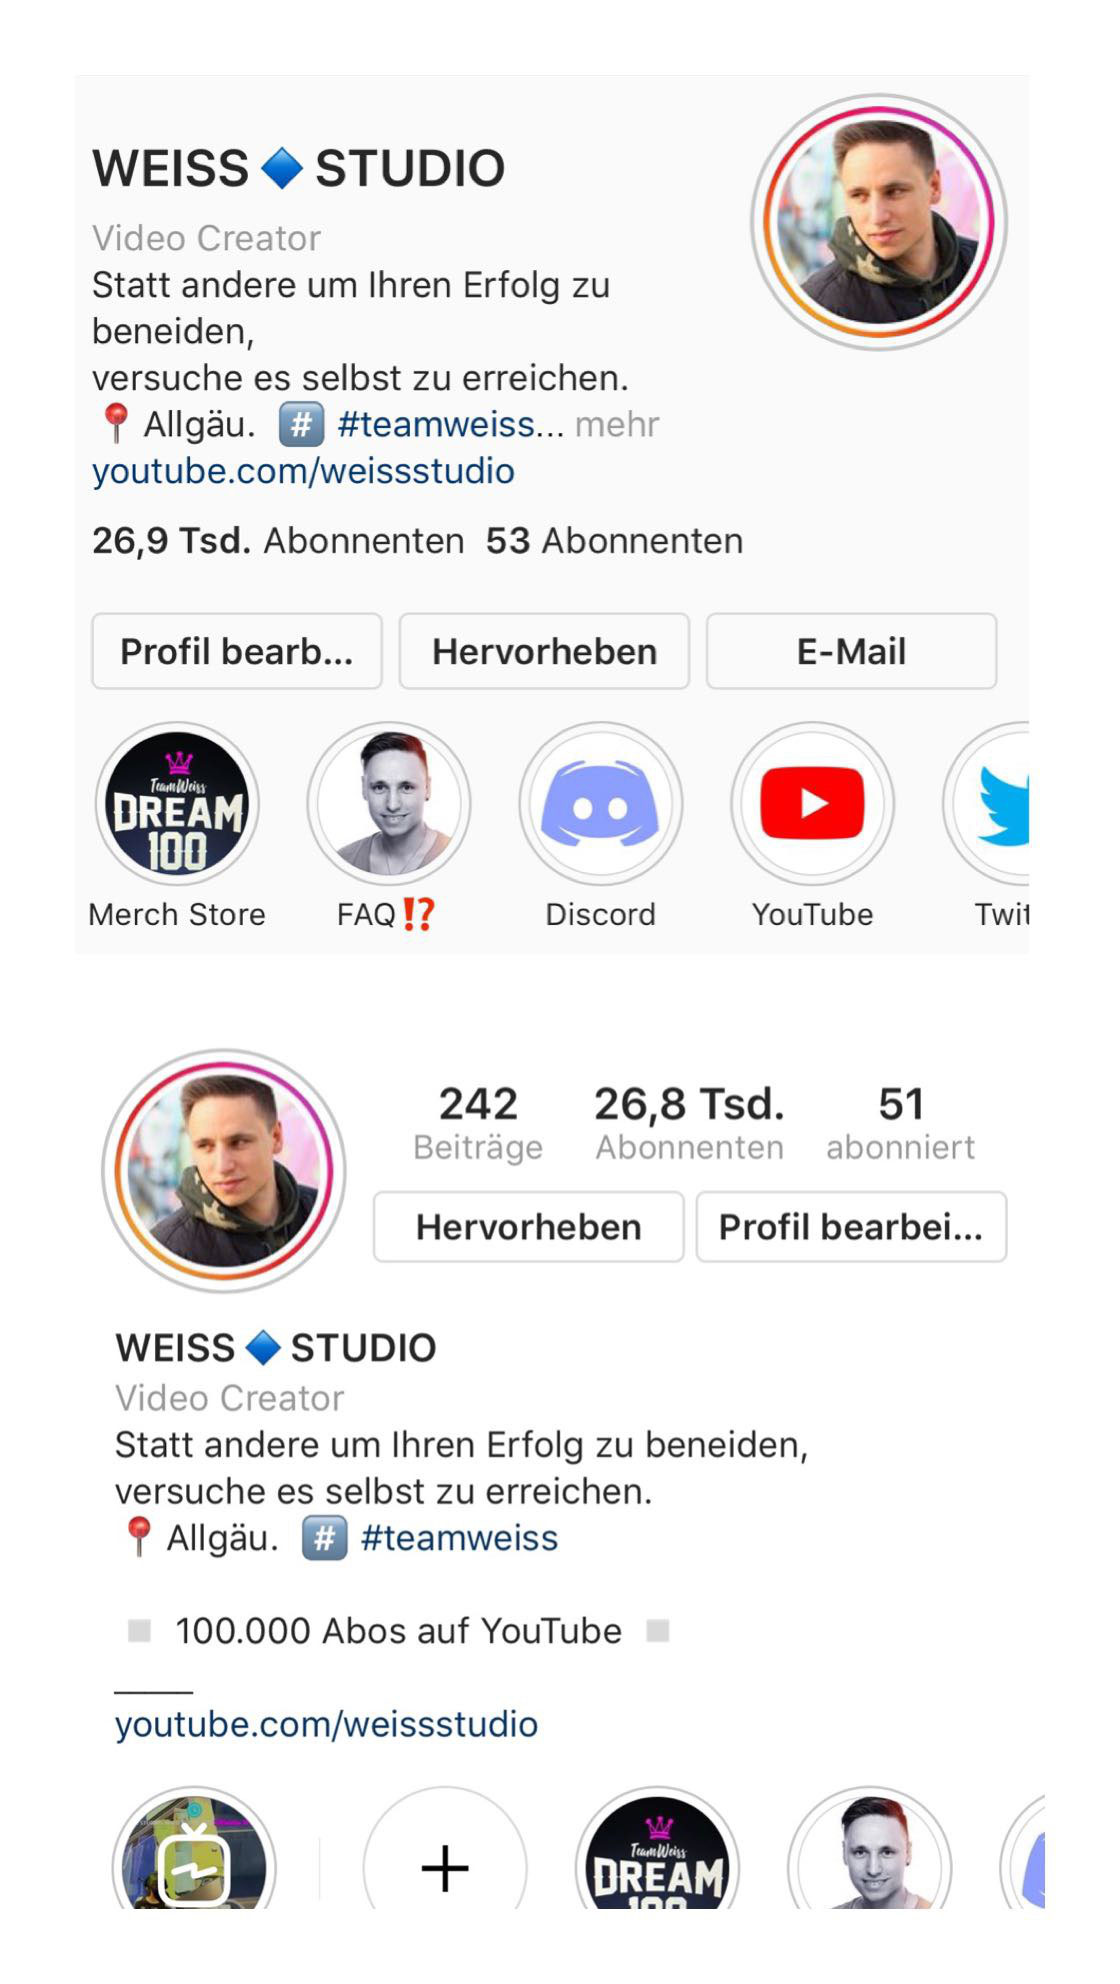 instagram neues Profil Design - WeissStudio